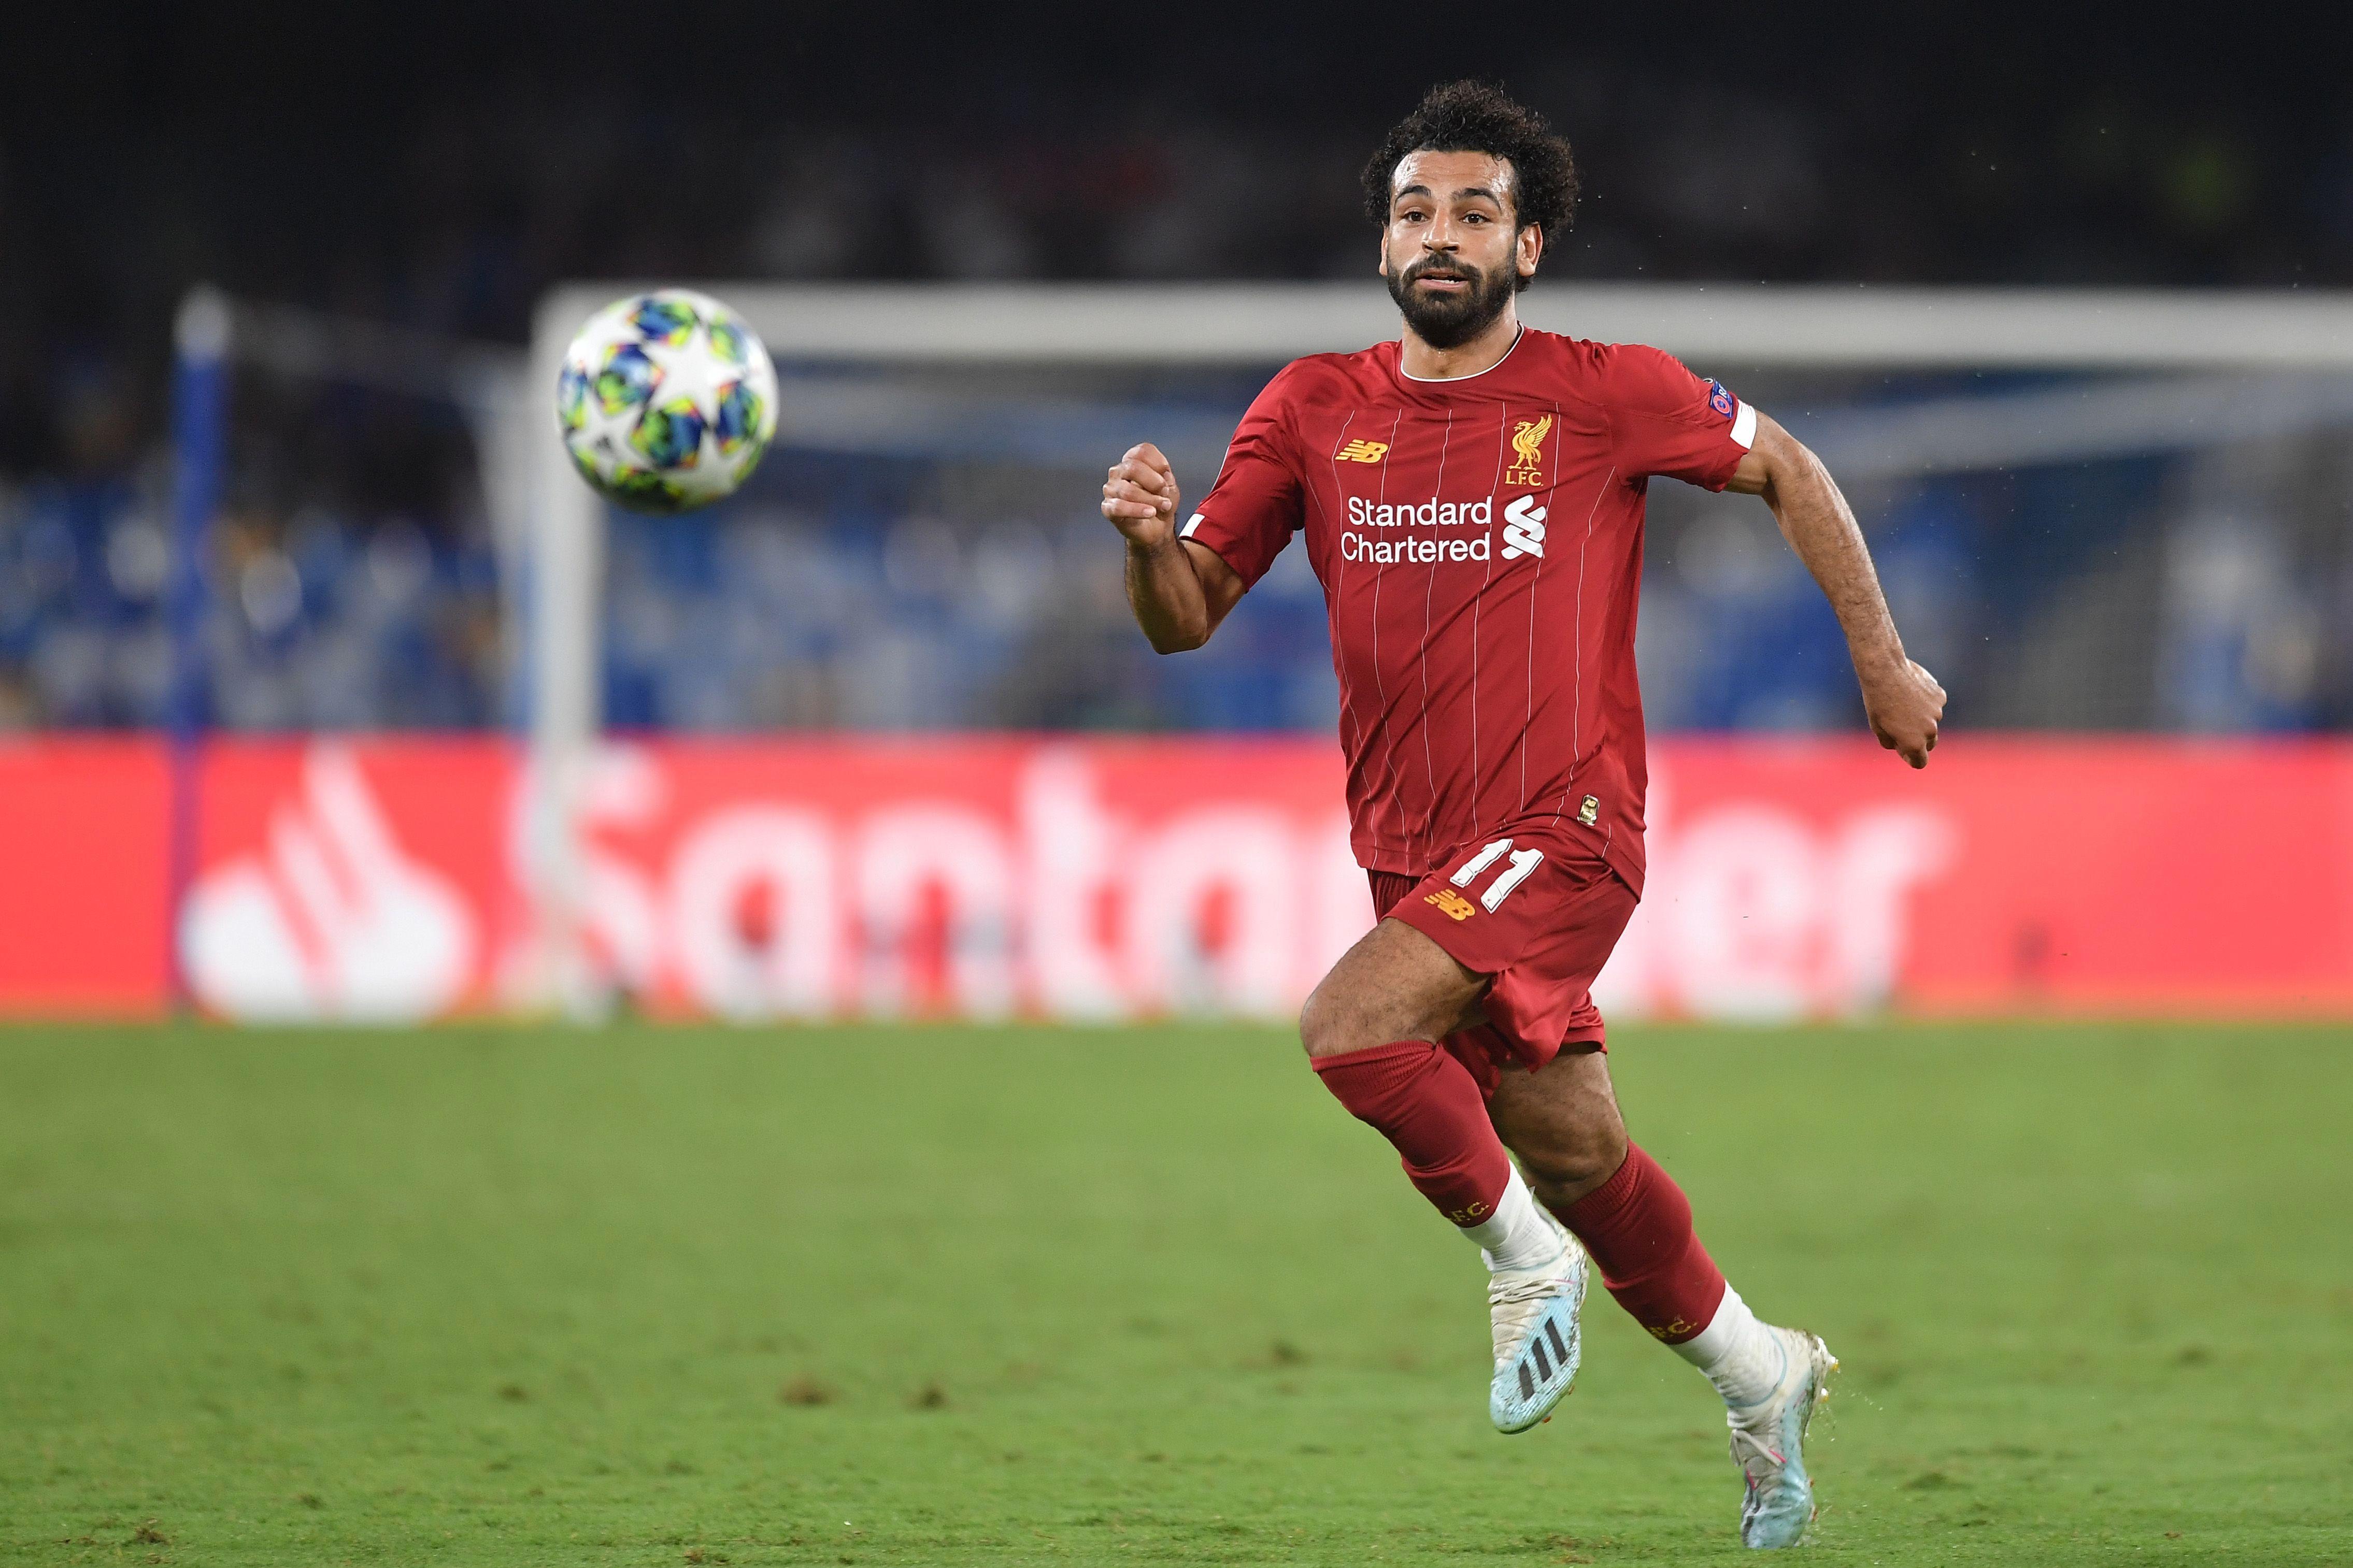 Football - Etranger - Premier League : Liverpool-Manchester City en direct